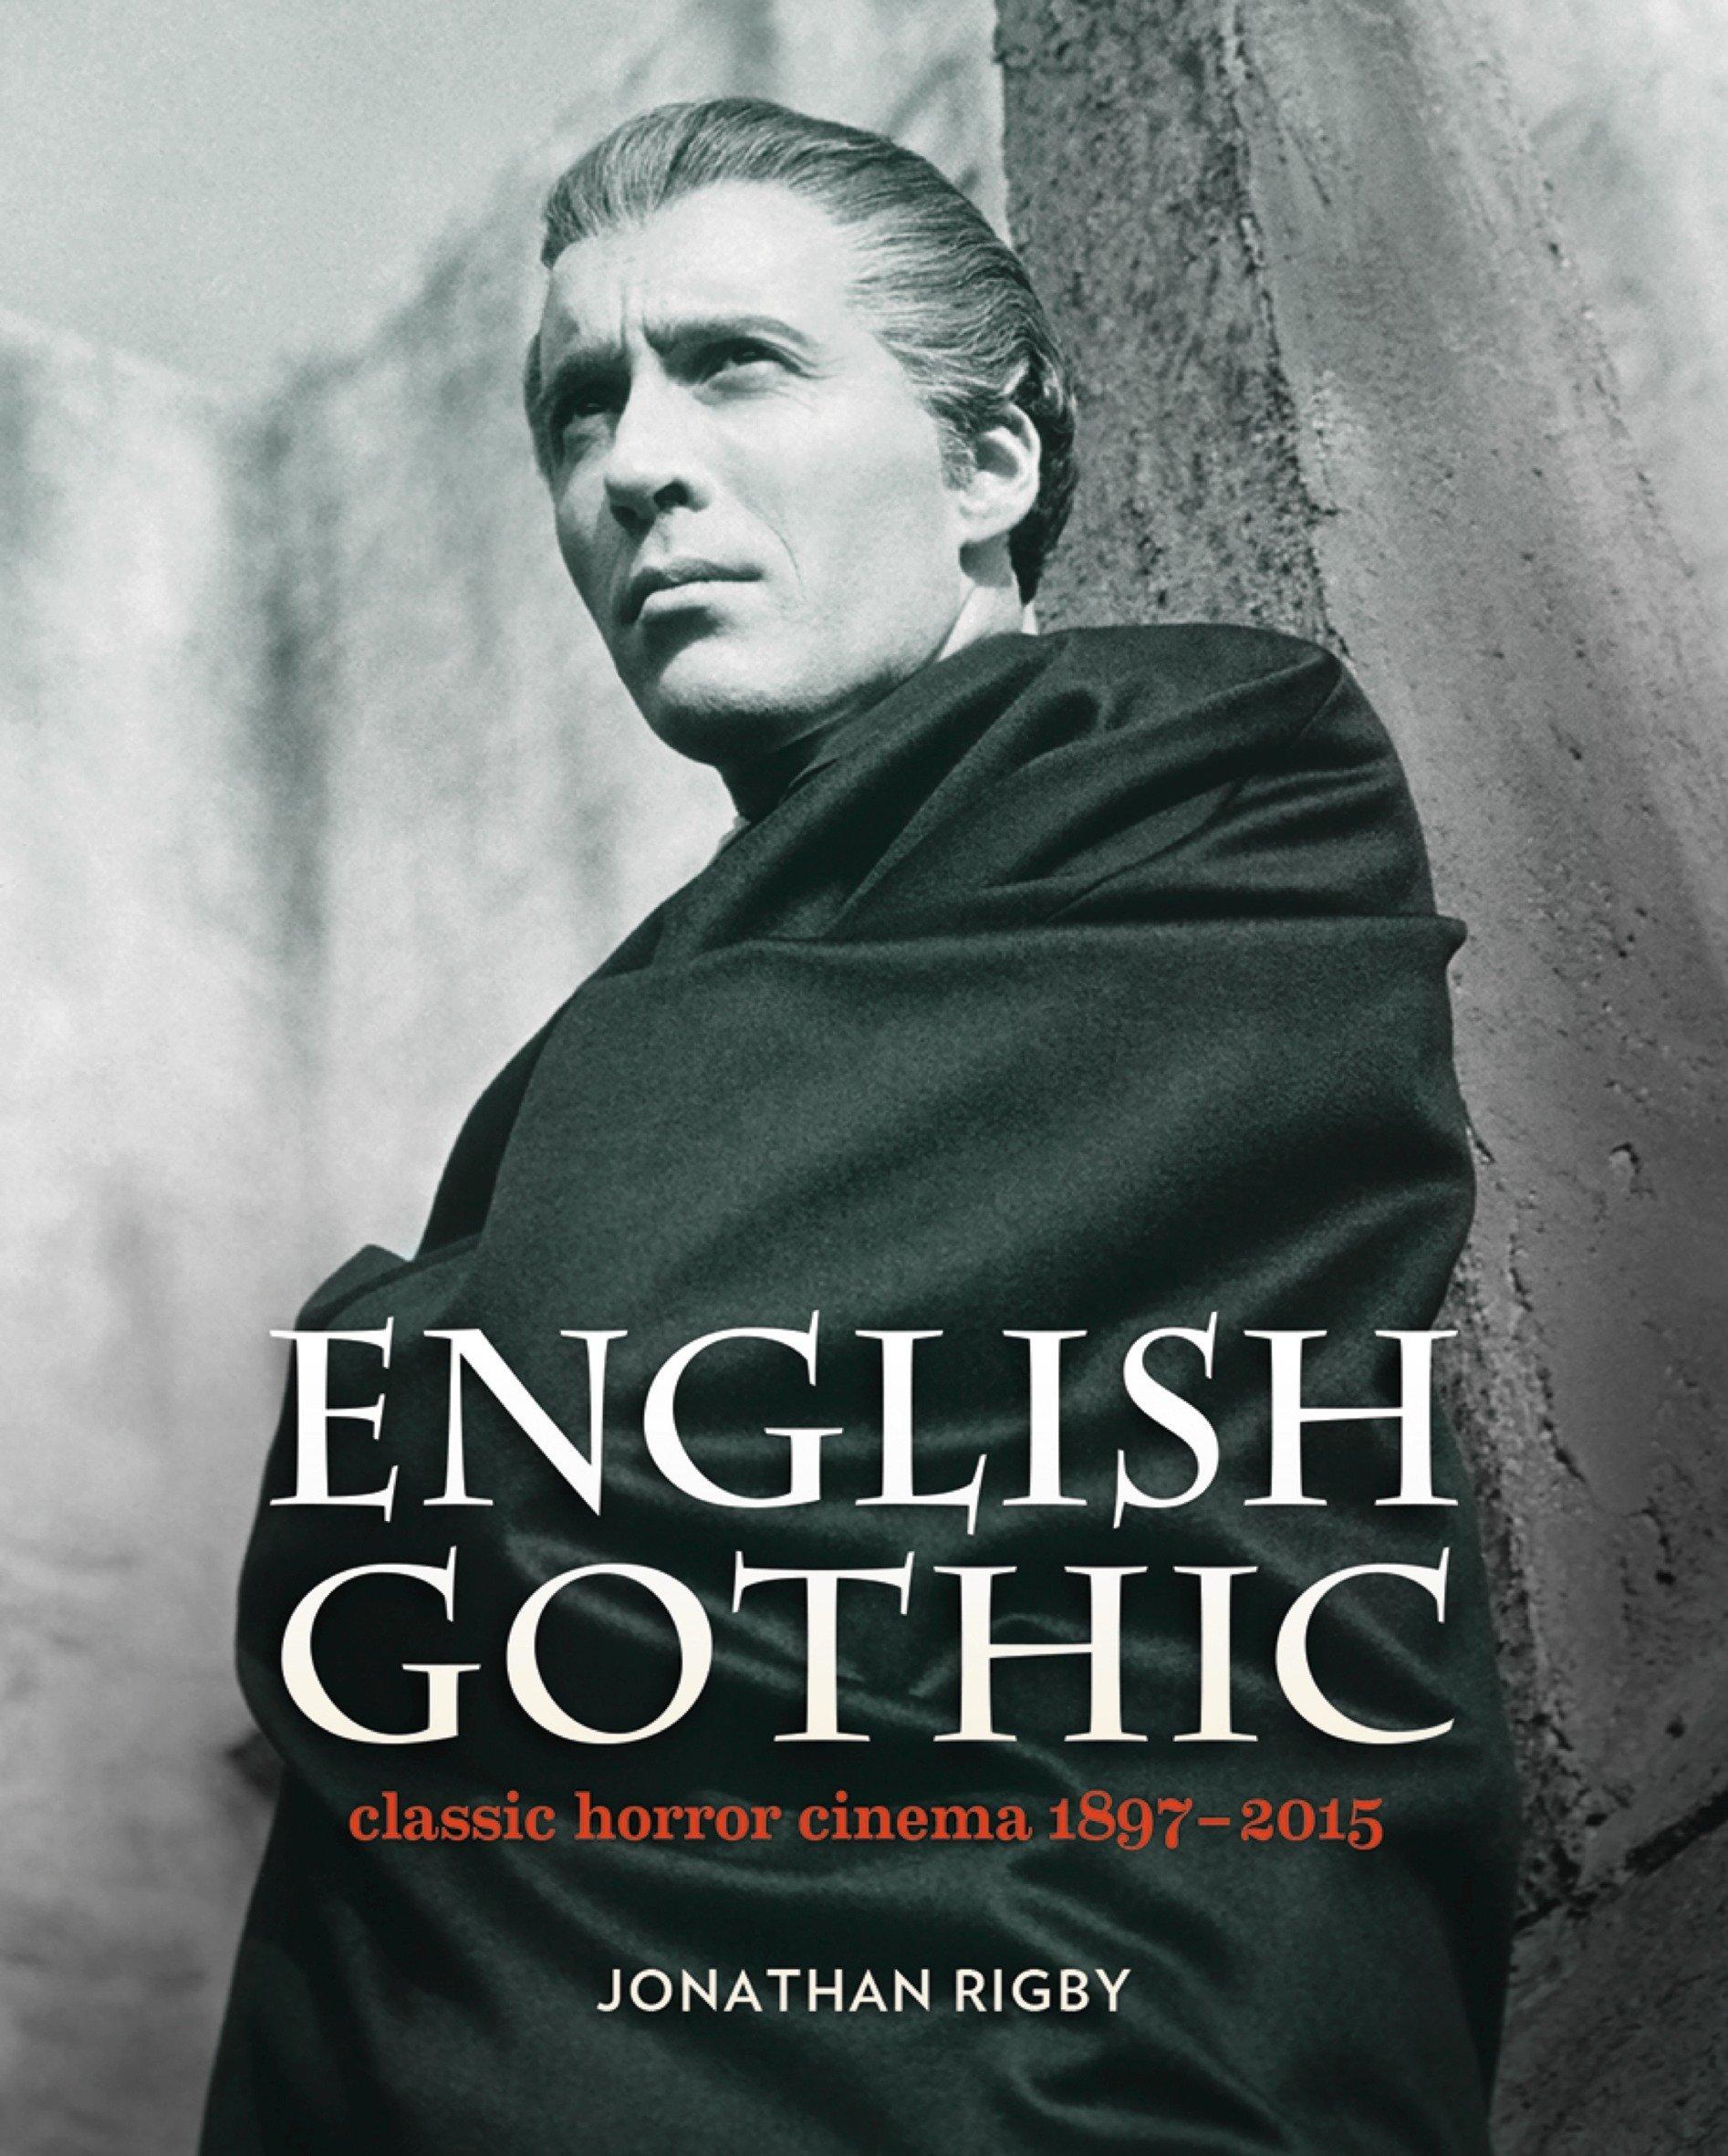 English Gothic: Classic Horror Cinema 1897-2015: Amazon.co.uk: Jonathan  Rigby: Books